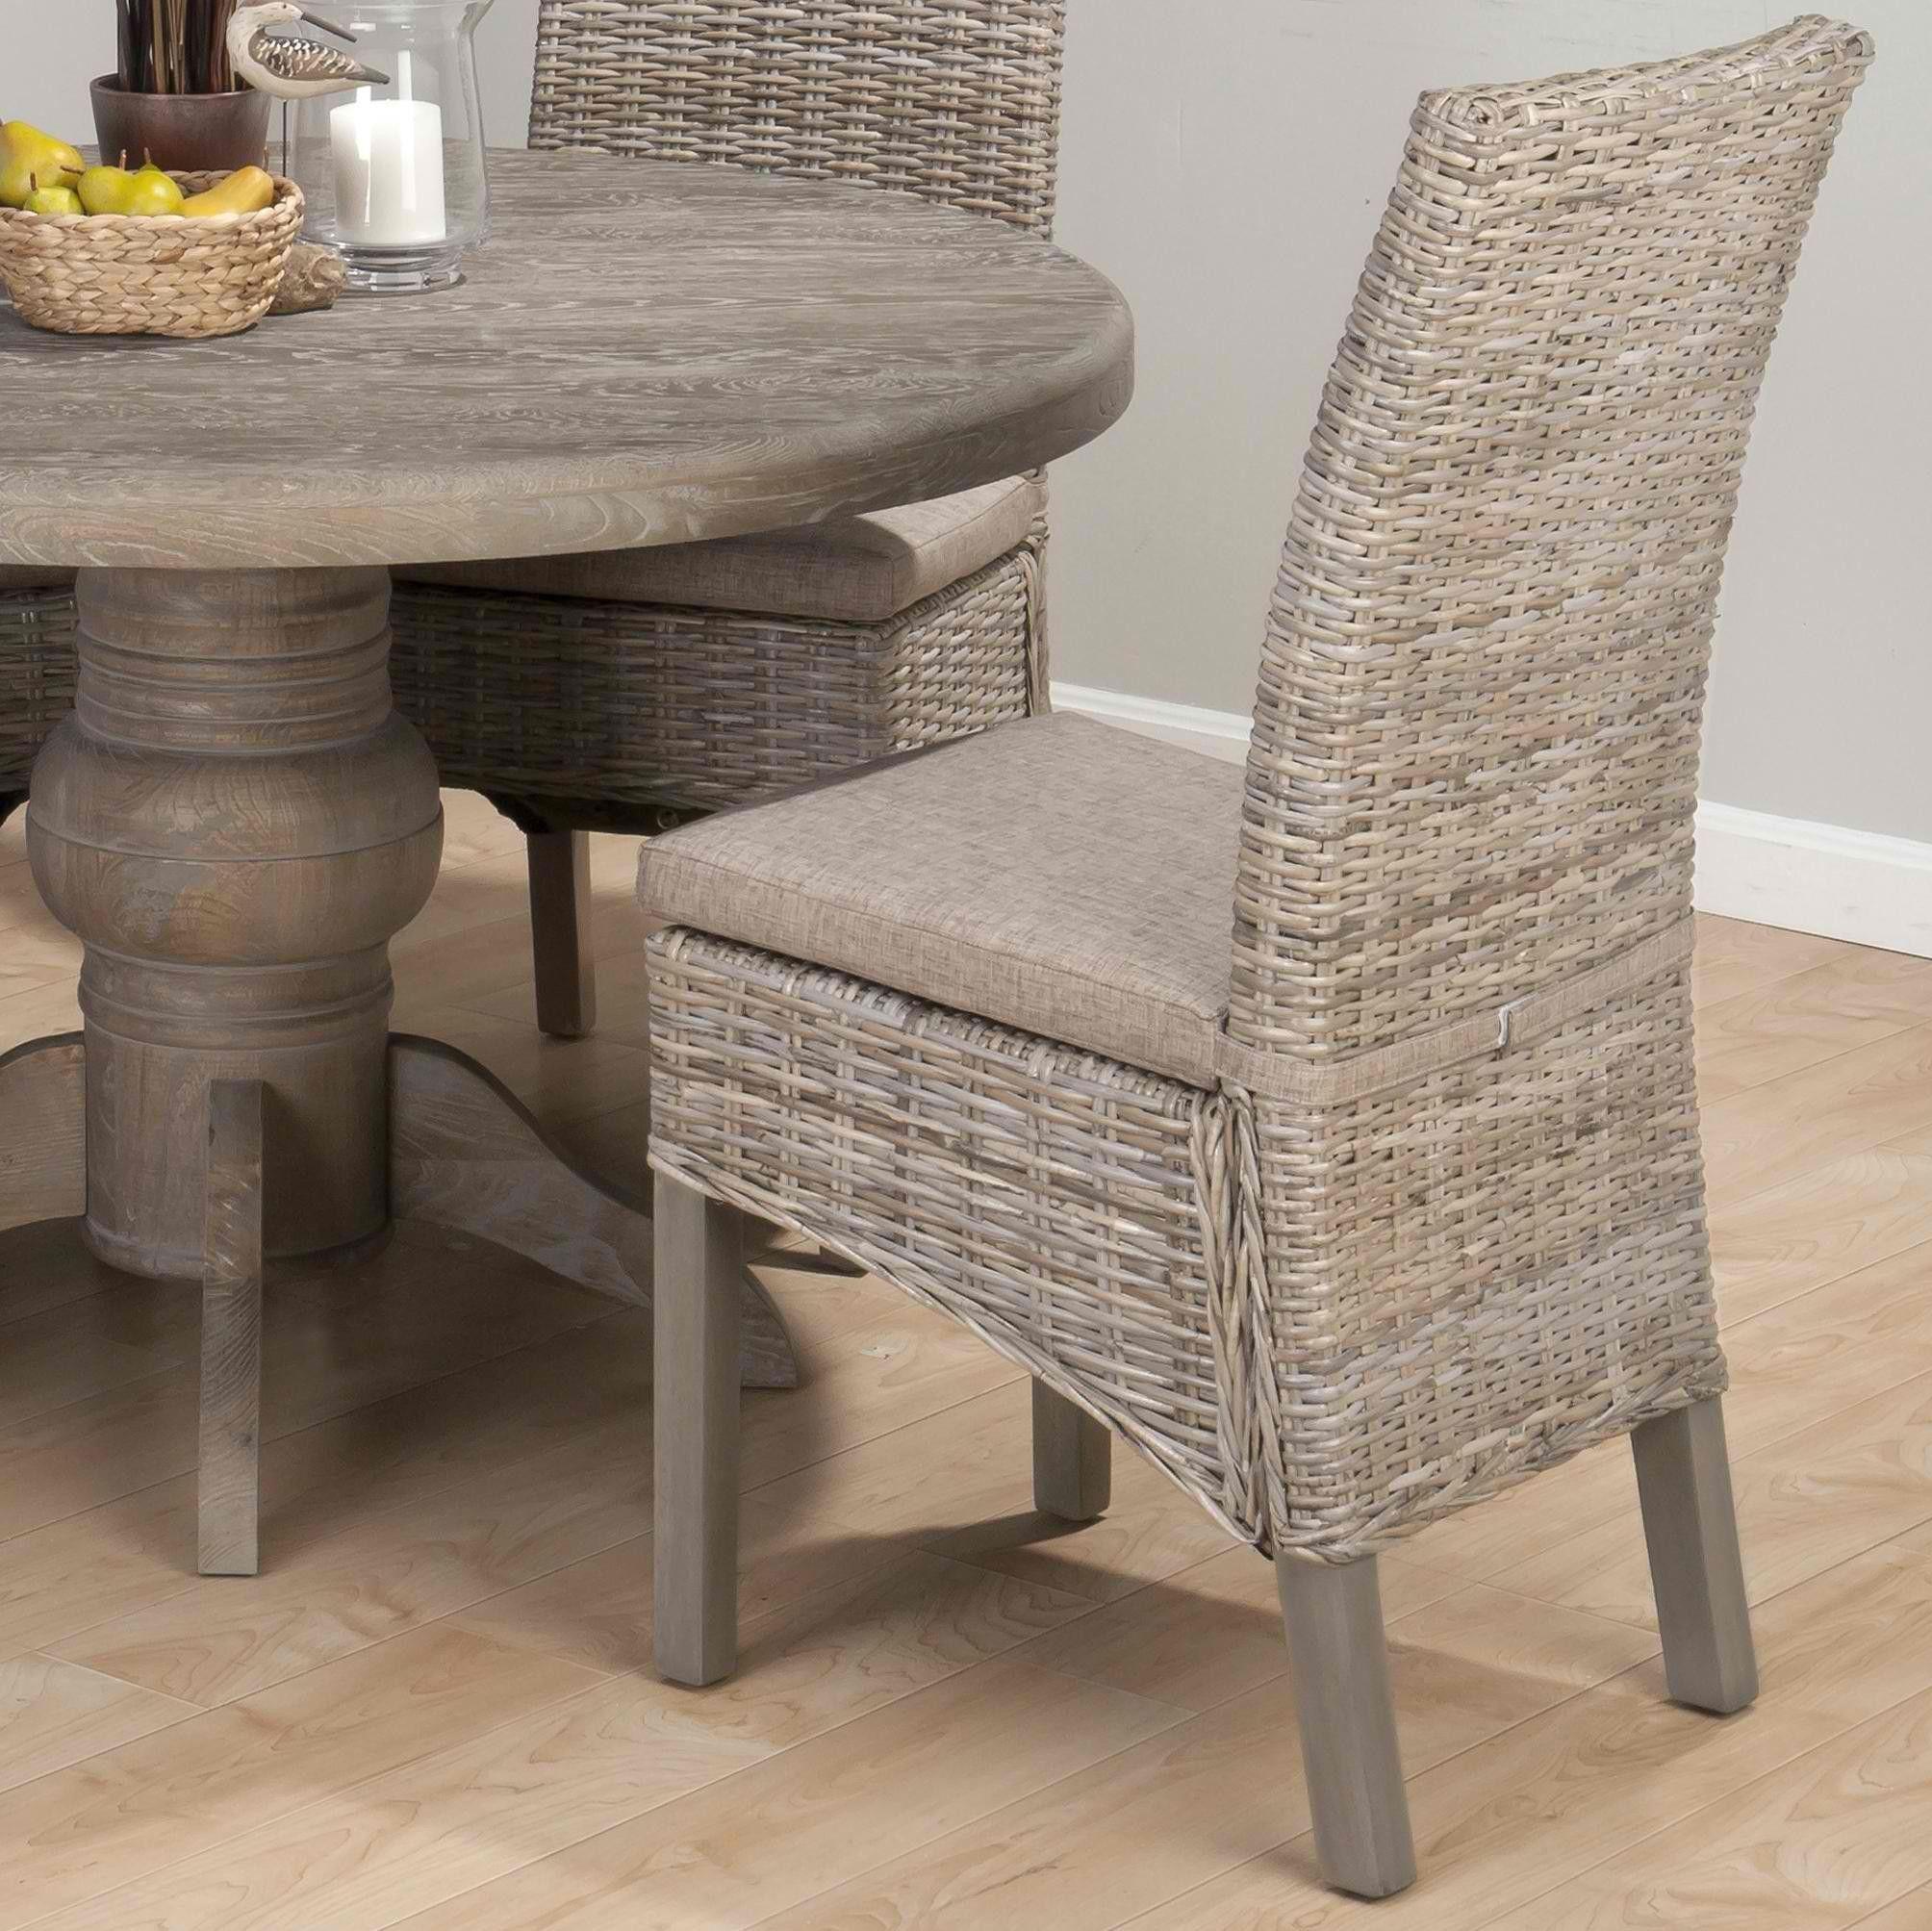 jofran burnt grey kubu rattan side chair oatmeal linen seat option rh pinterest com